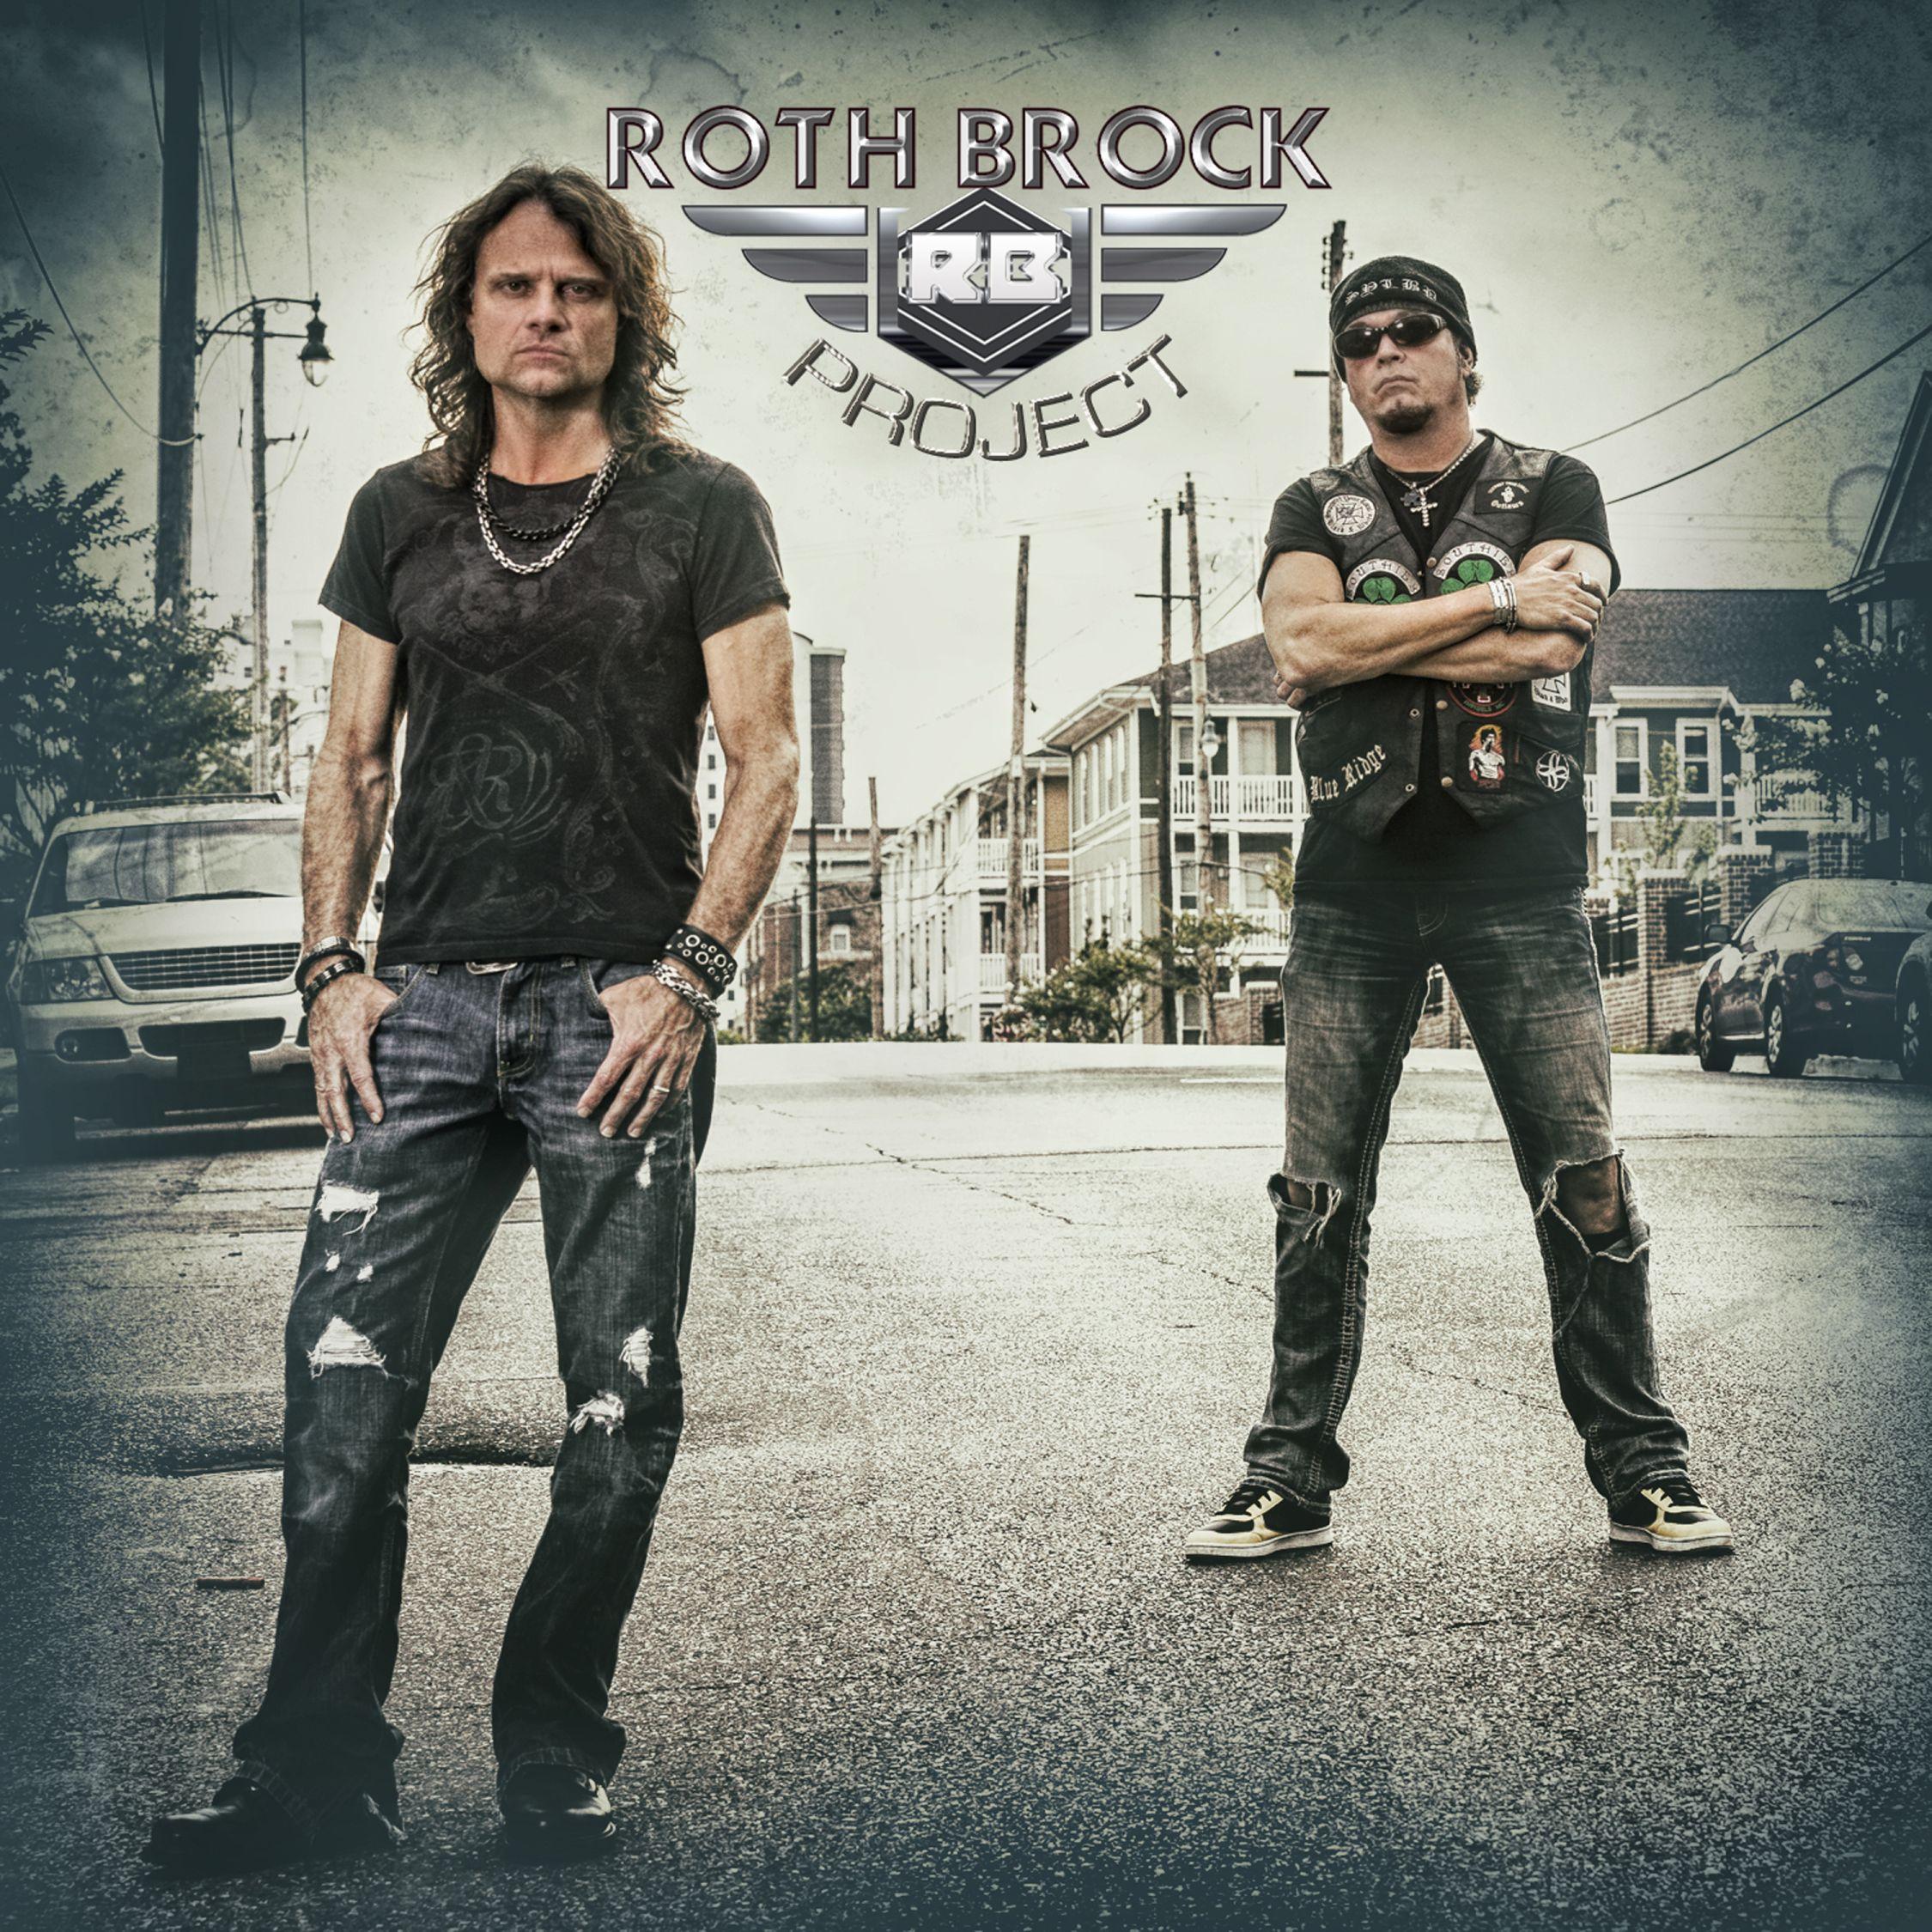 ROTH_BROCK_PRJ_cover_HI